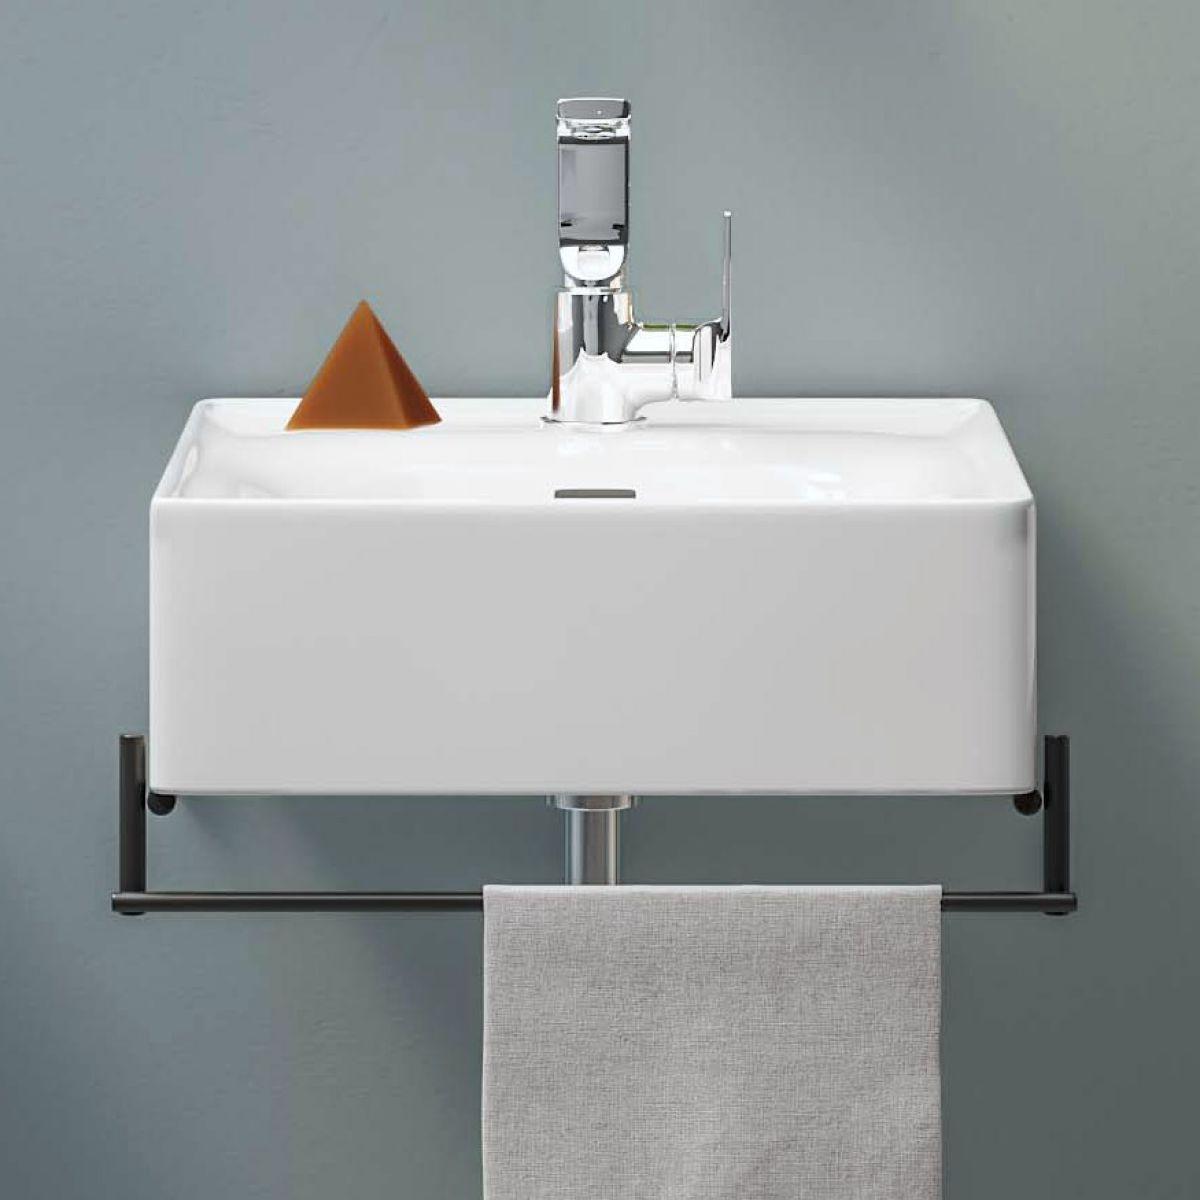 VitrA Equal Basin with Black Towel Rail - 64079